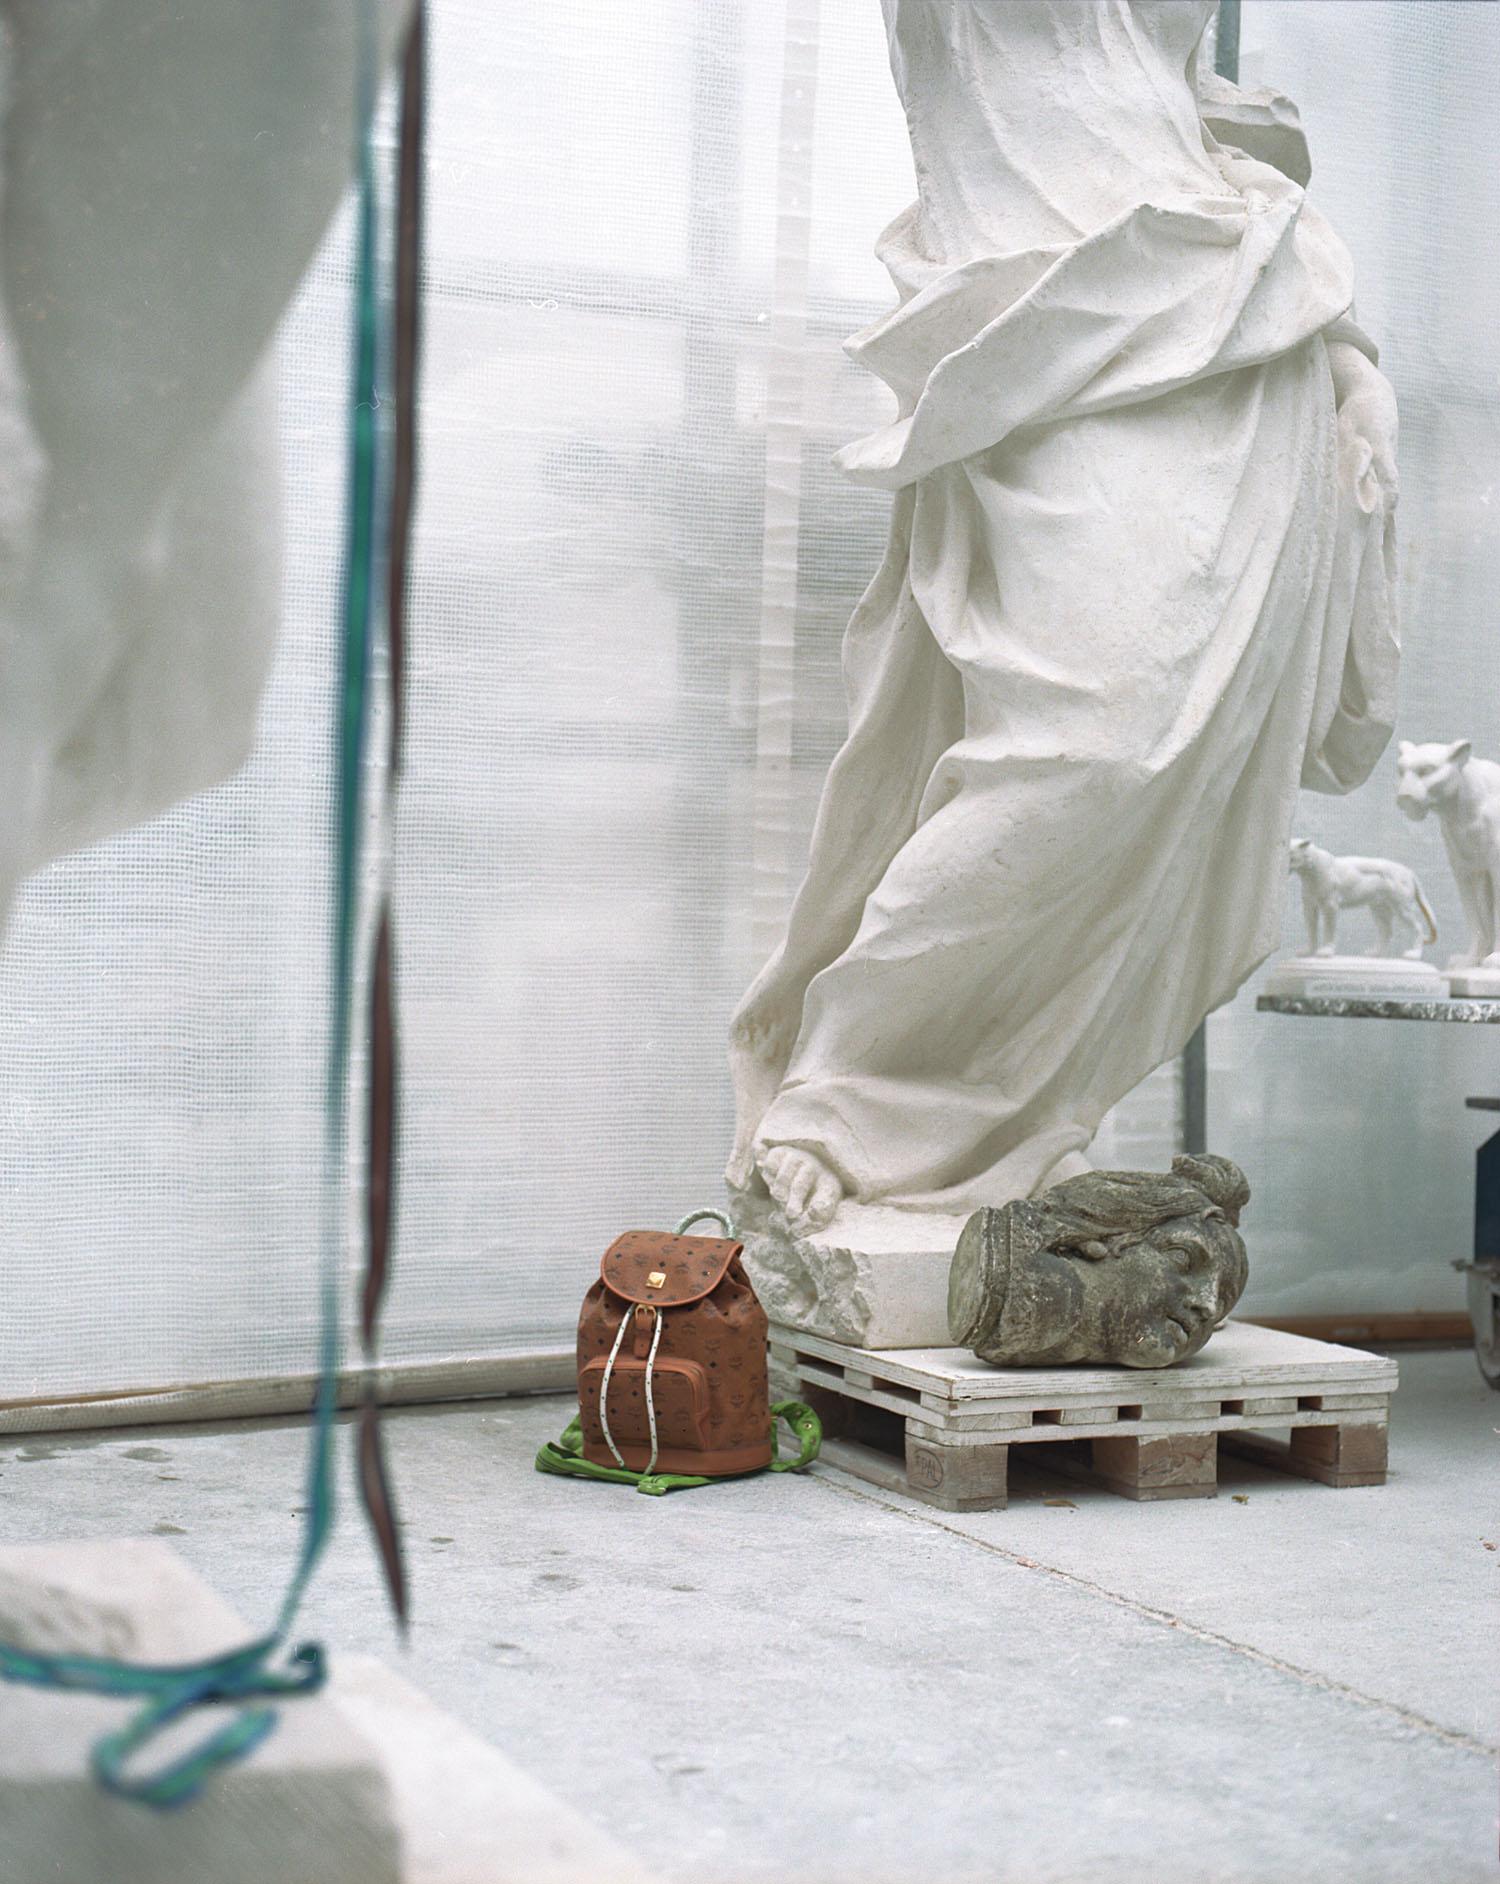 Fashion-MCM-KoenigSouvenir-ClaraRenner-08